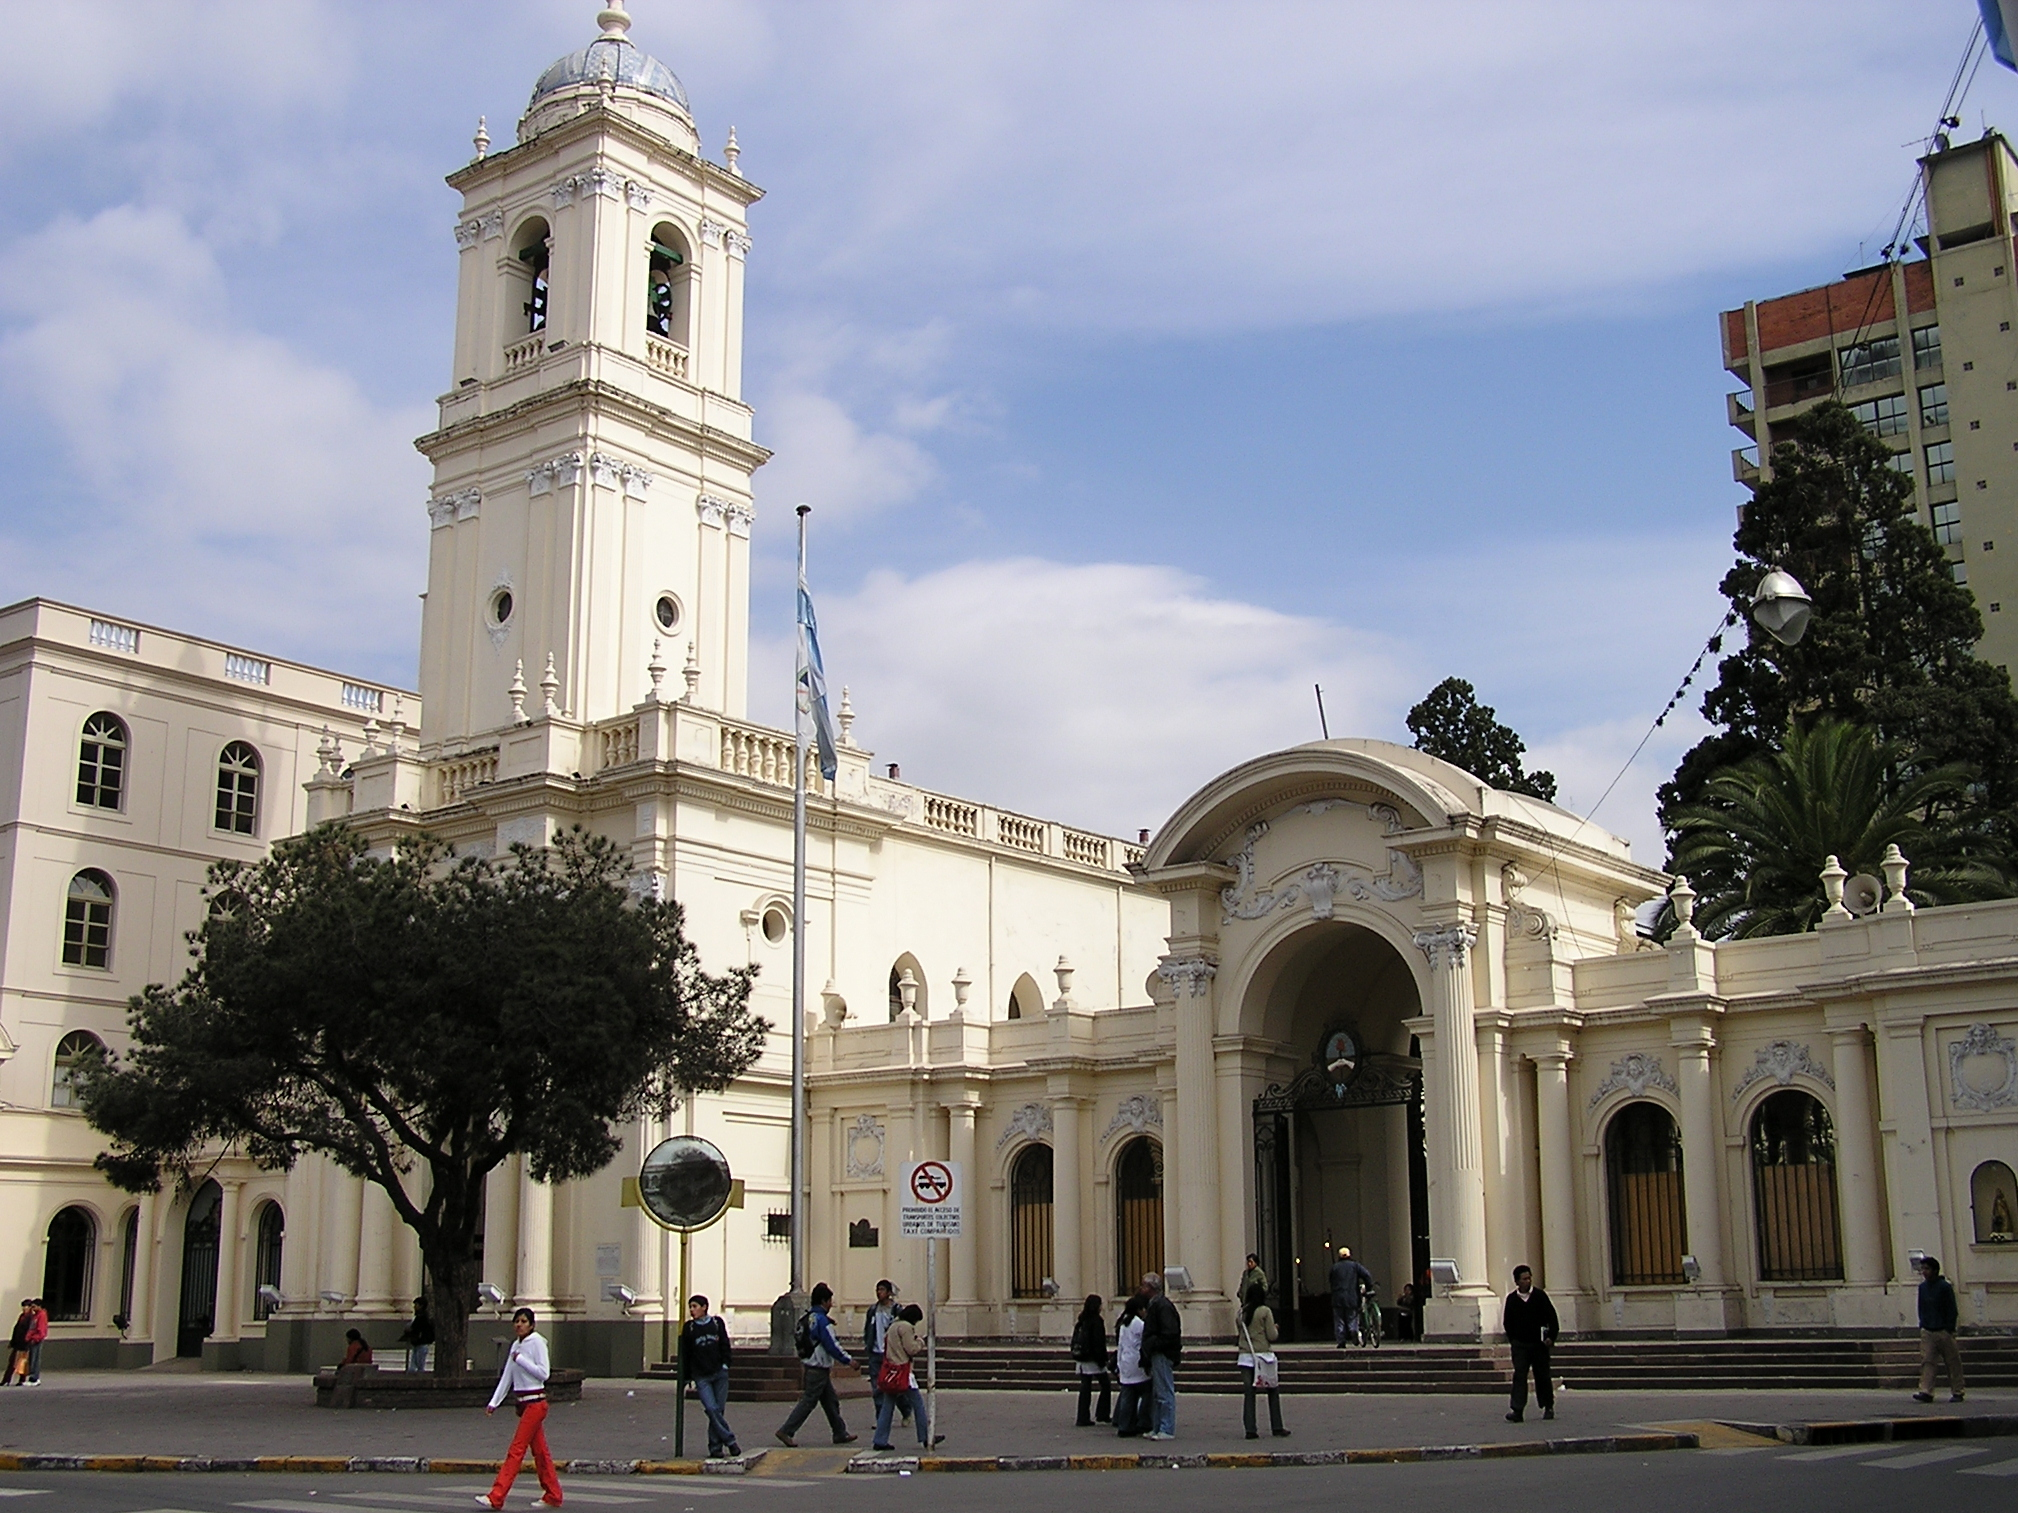 File:Catedral de San Salvador de Jujuy 02.JPG - Wikimedia Commons